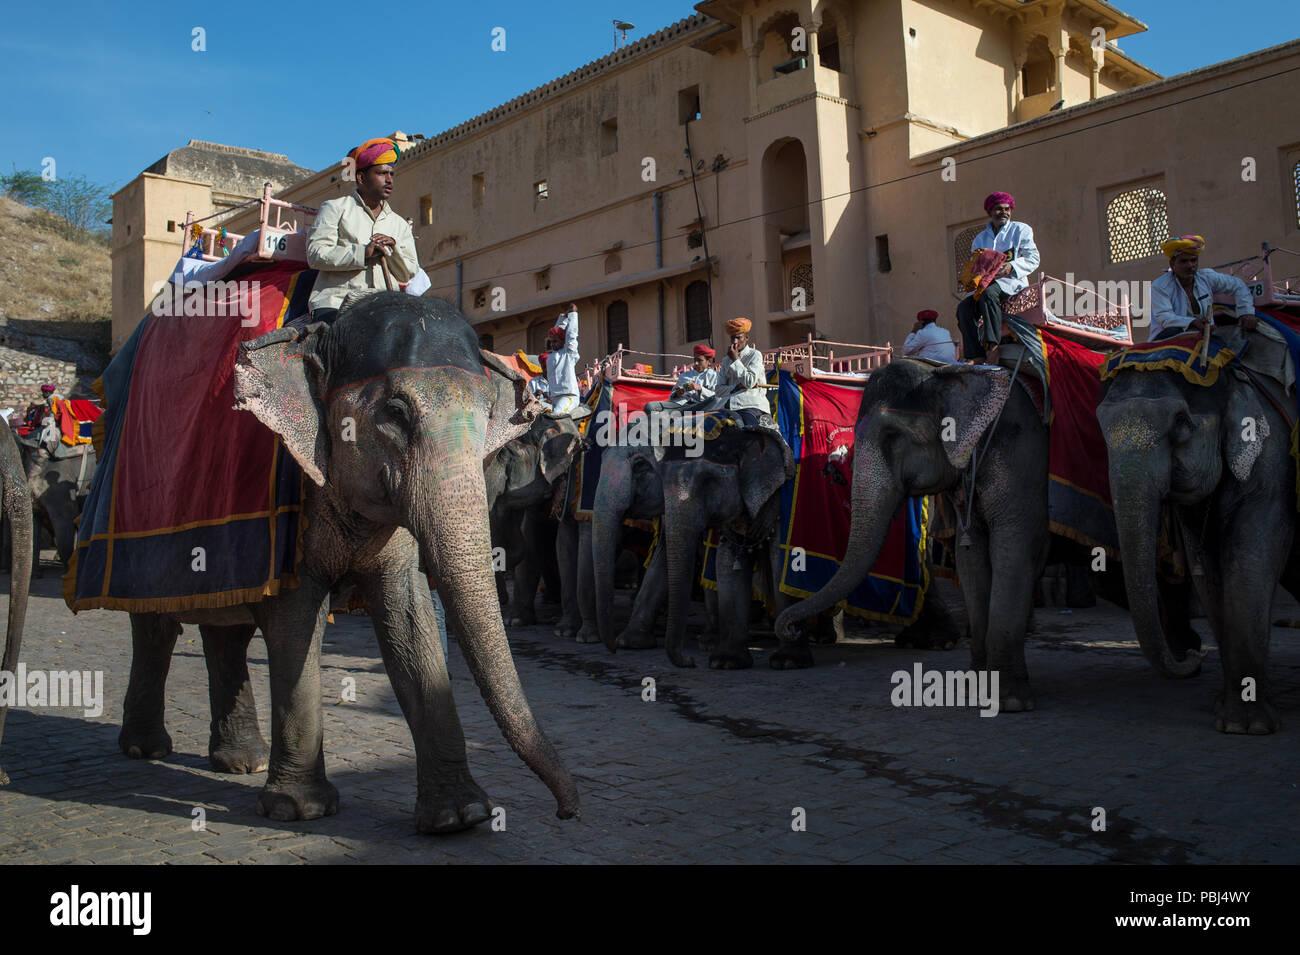 Amber Fort, Jaipur, Rajasthan, India, Asia. - Stock Image